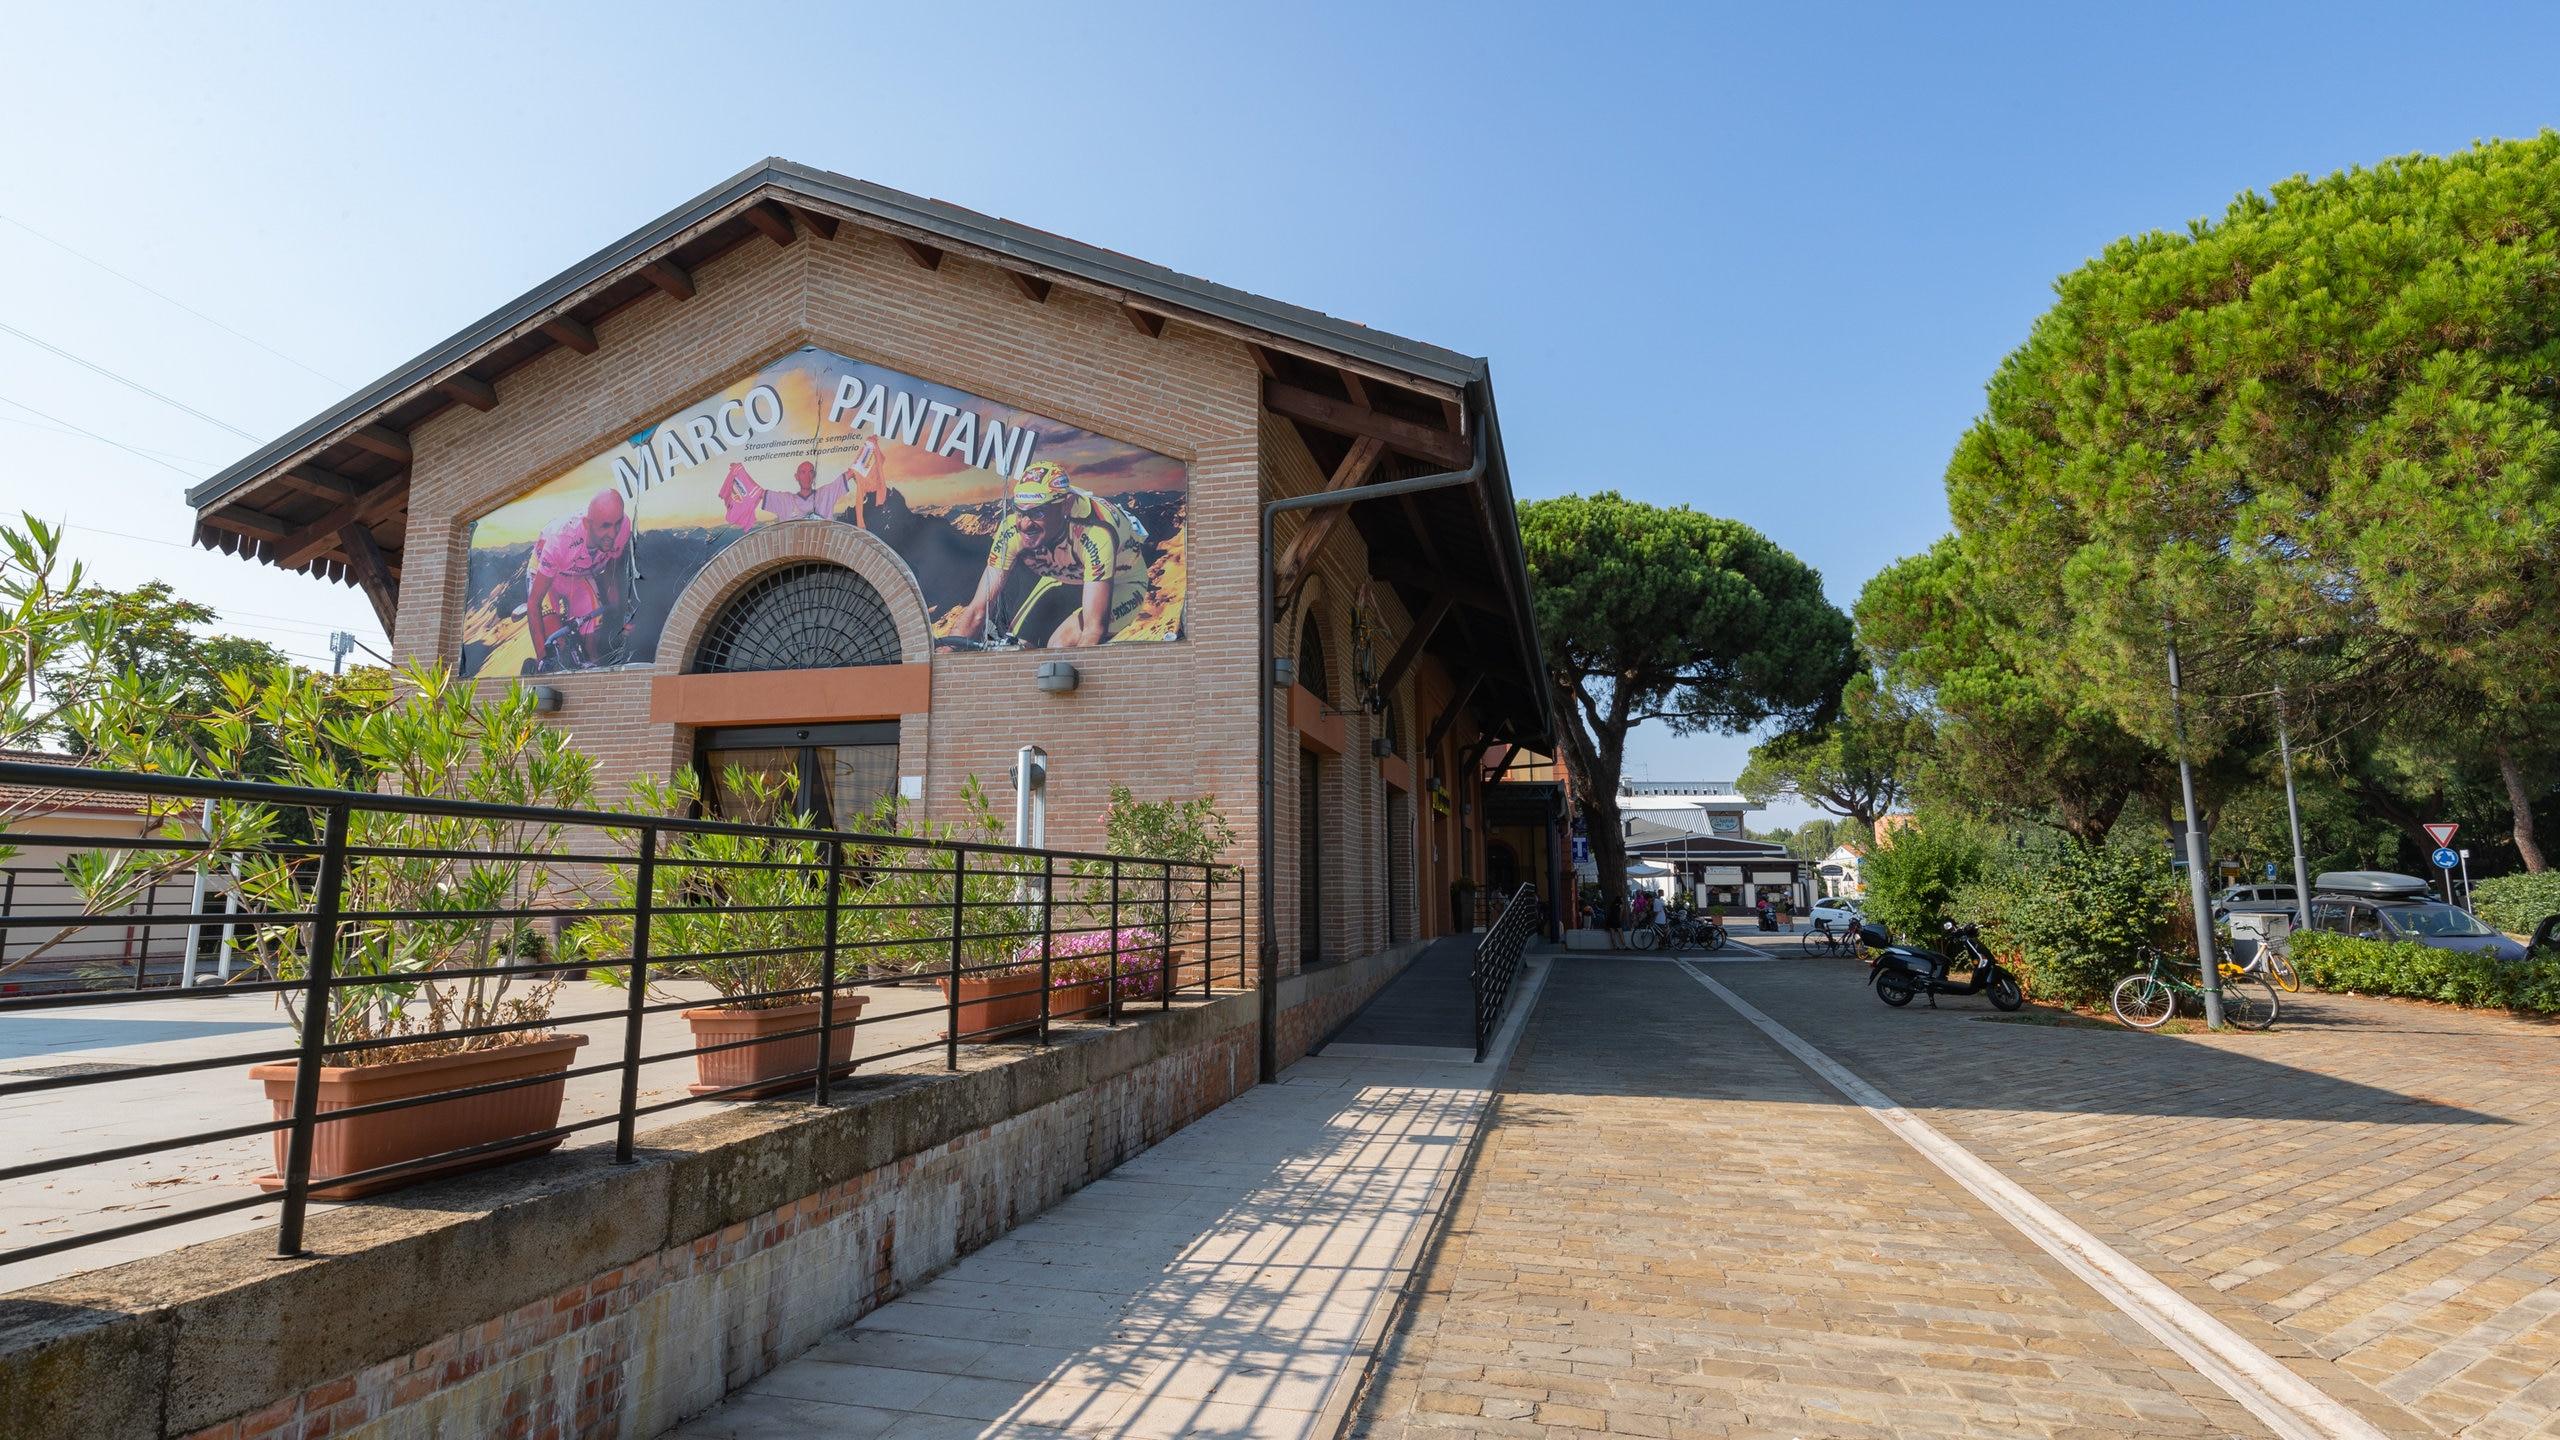 Museo Spazio Pantani, Cesenatico, Emilia-Romagna, Italië